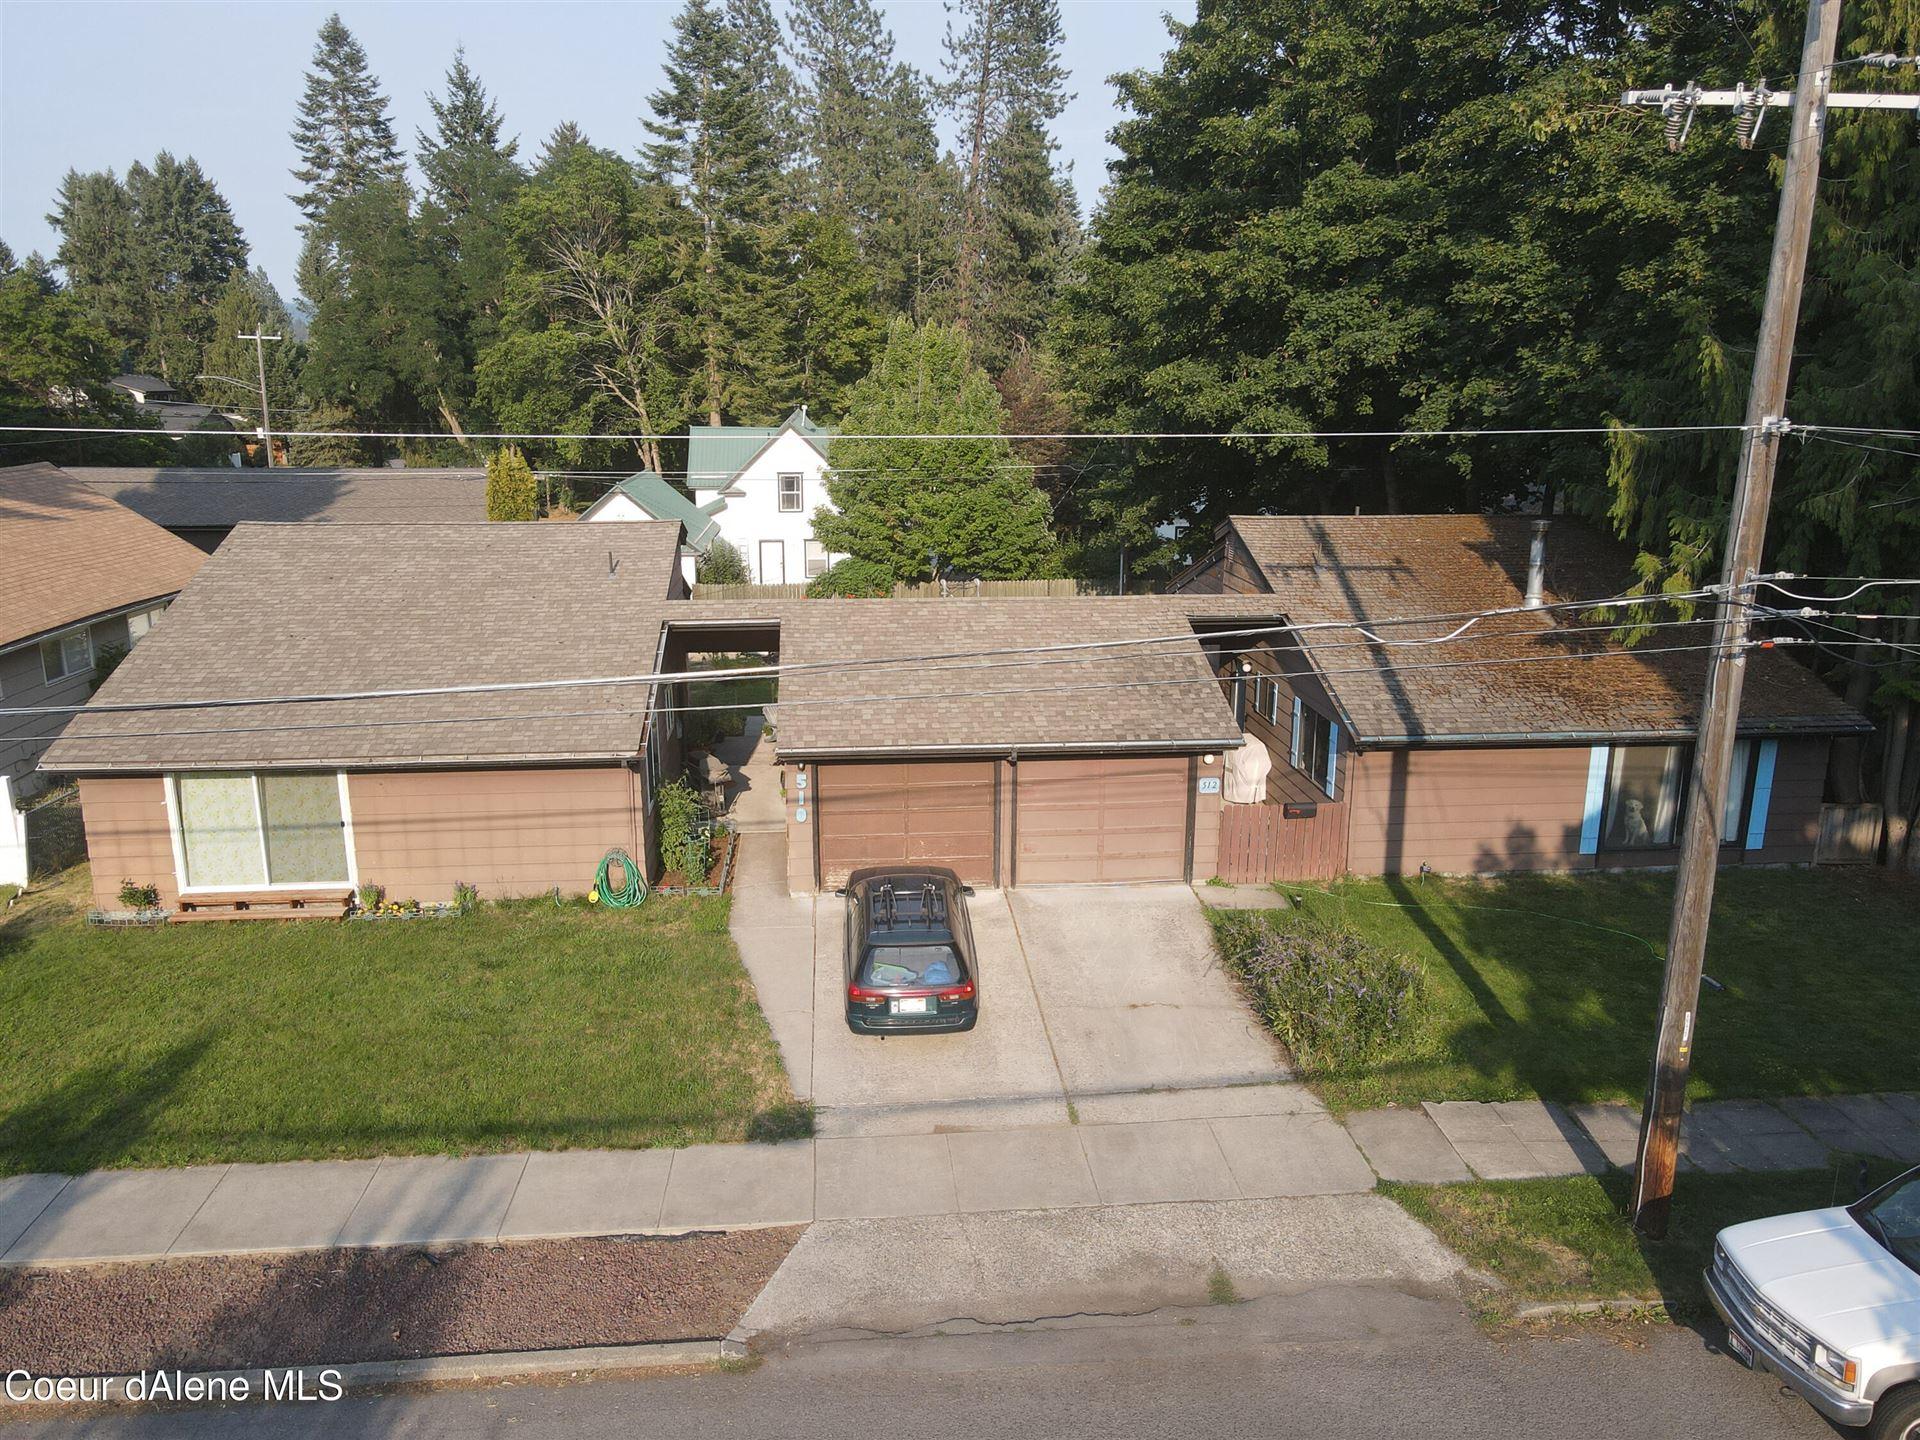 Photo of 510 S 11TH ST, Coeur dAlene, ID 83814 (MLS # 21-7506)